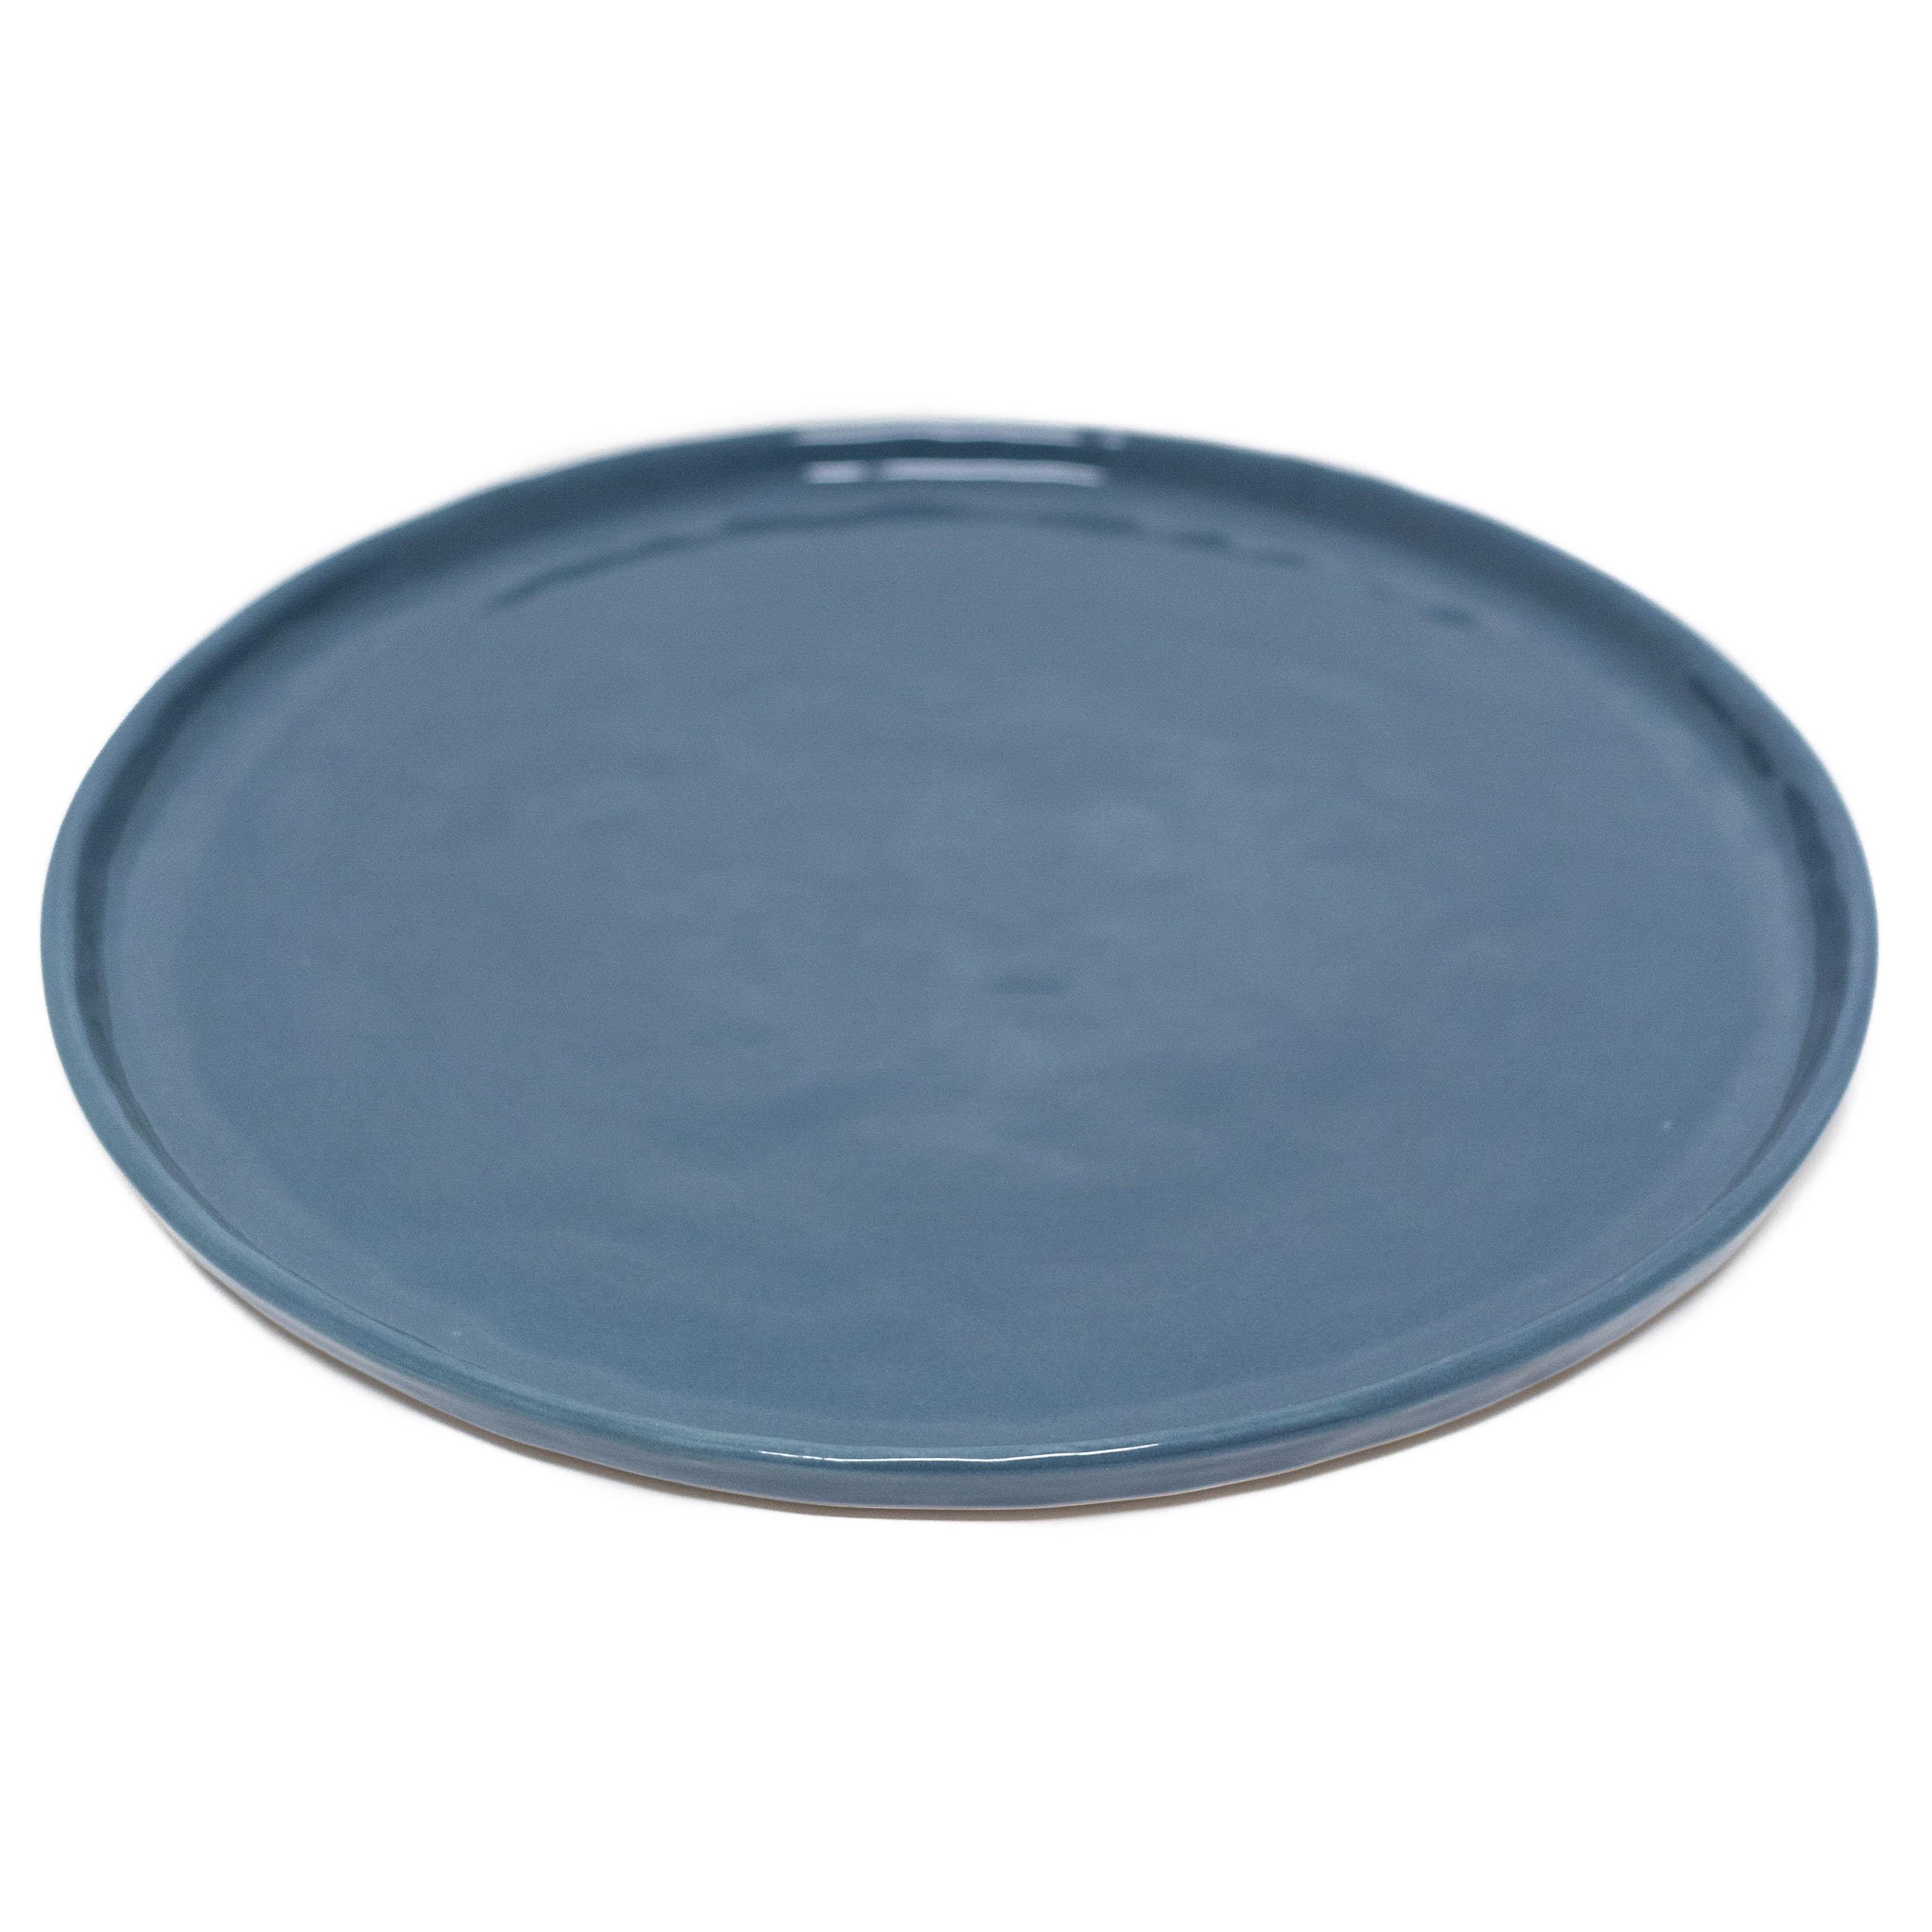 Blue Ceramic Dinner Plates